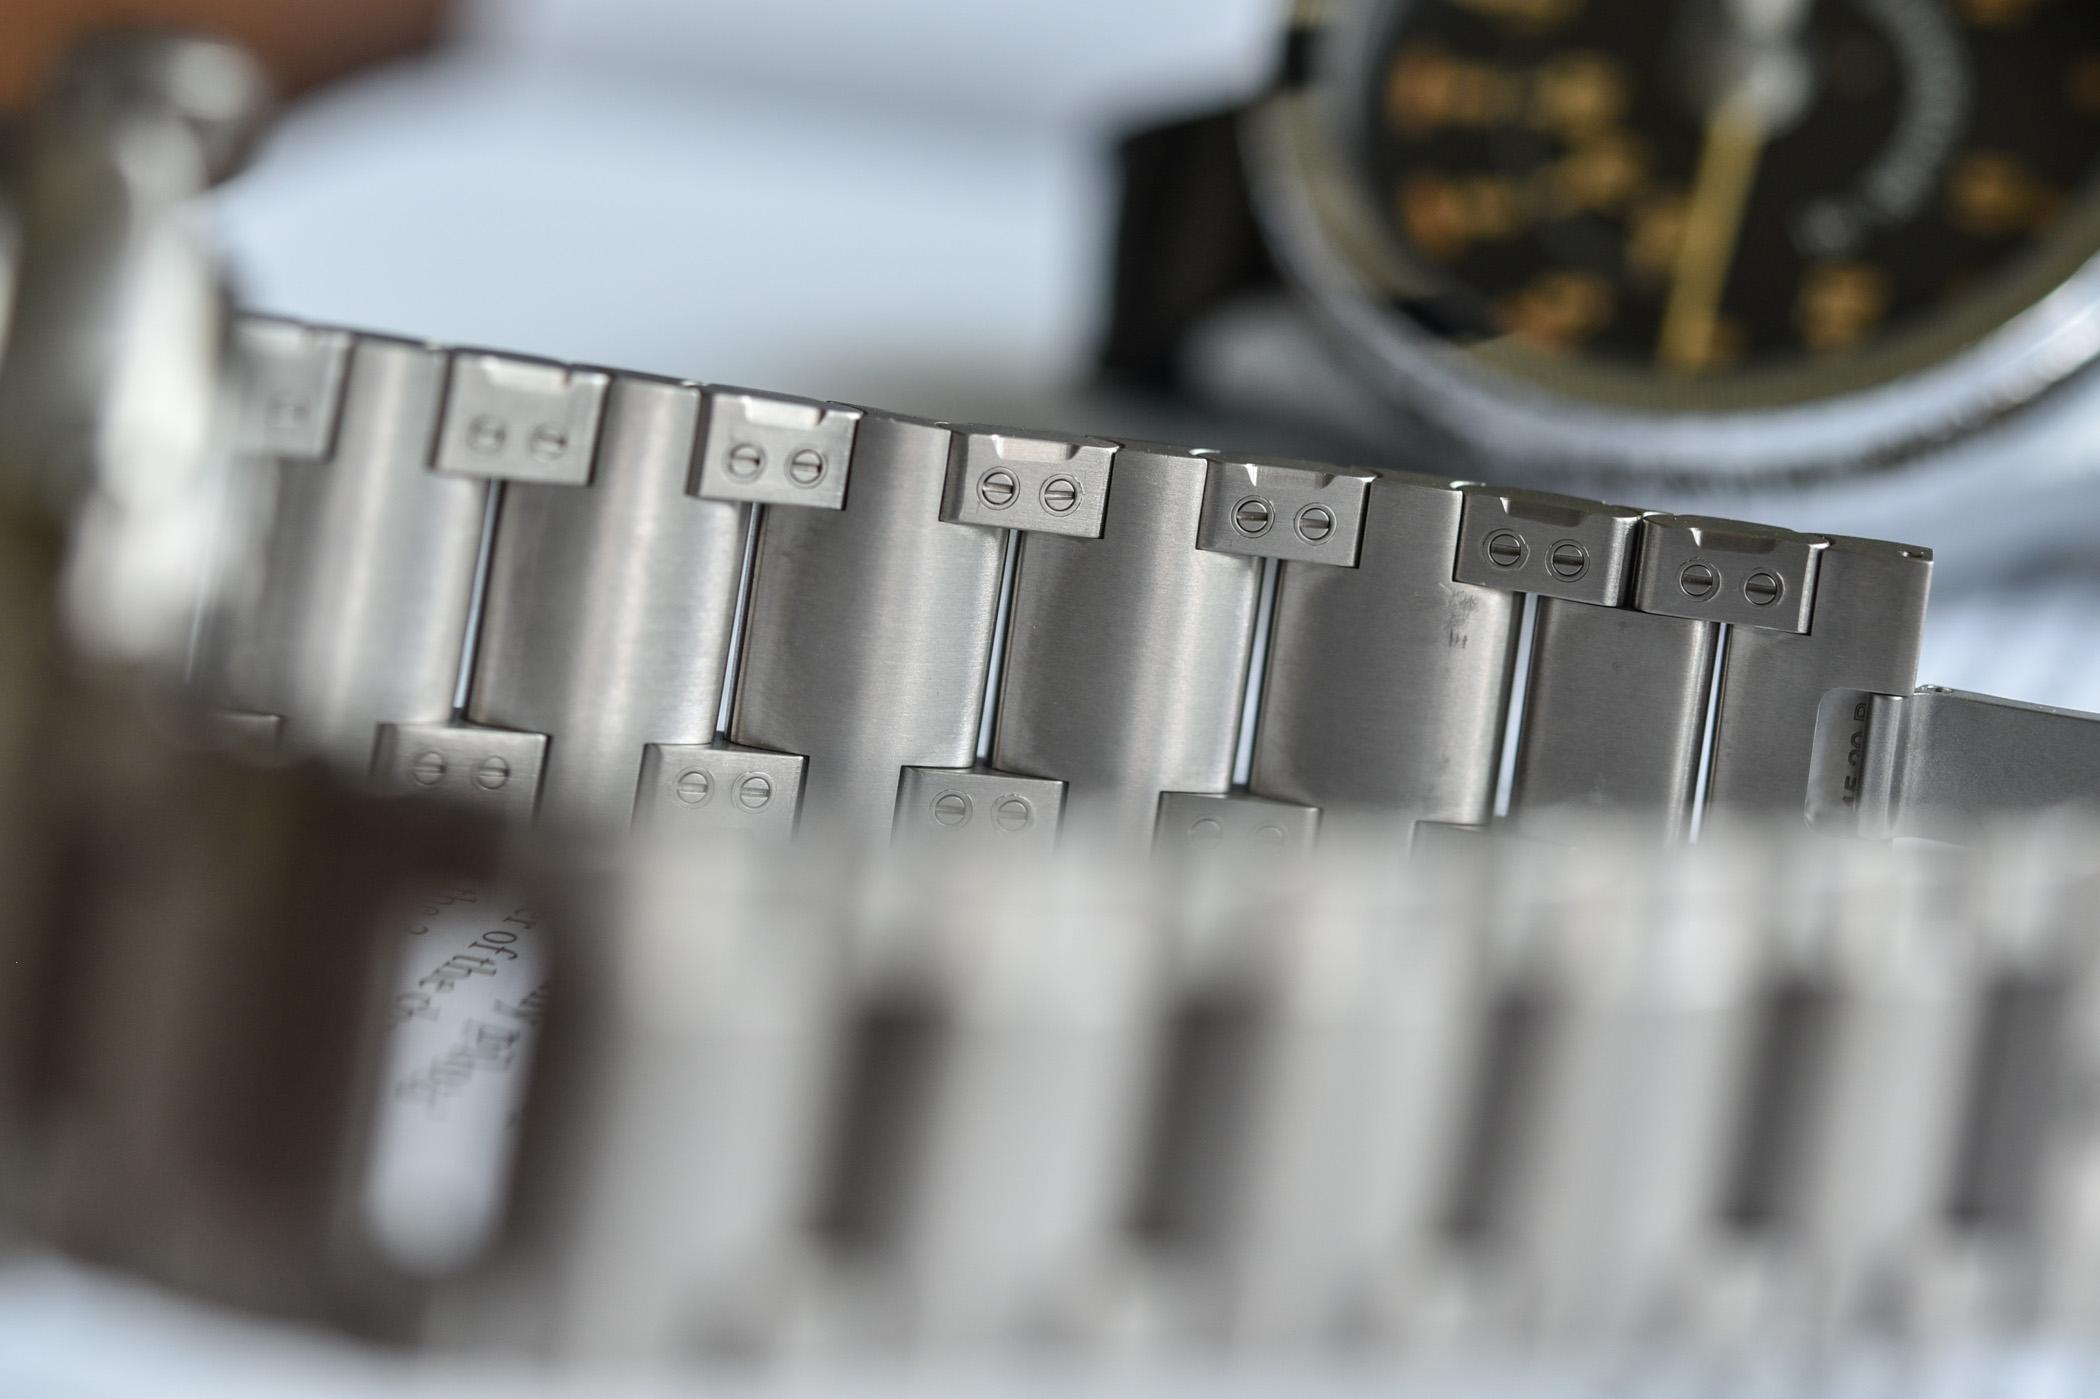 Blancpain Fifty Fathoms Grande Date Titanium Bracelet - 5050-12B30-98